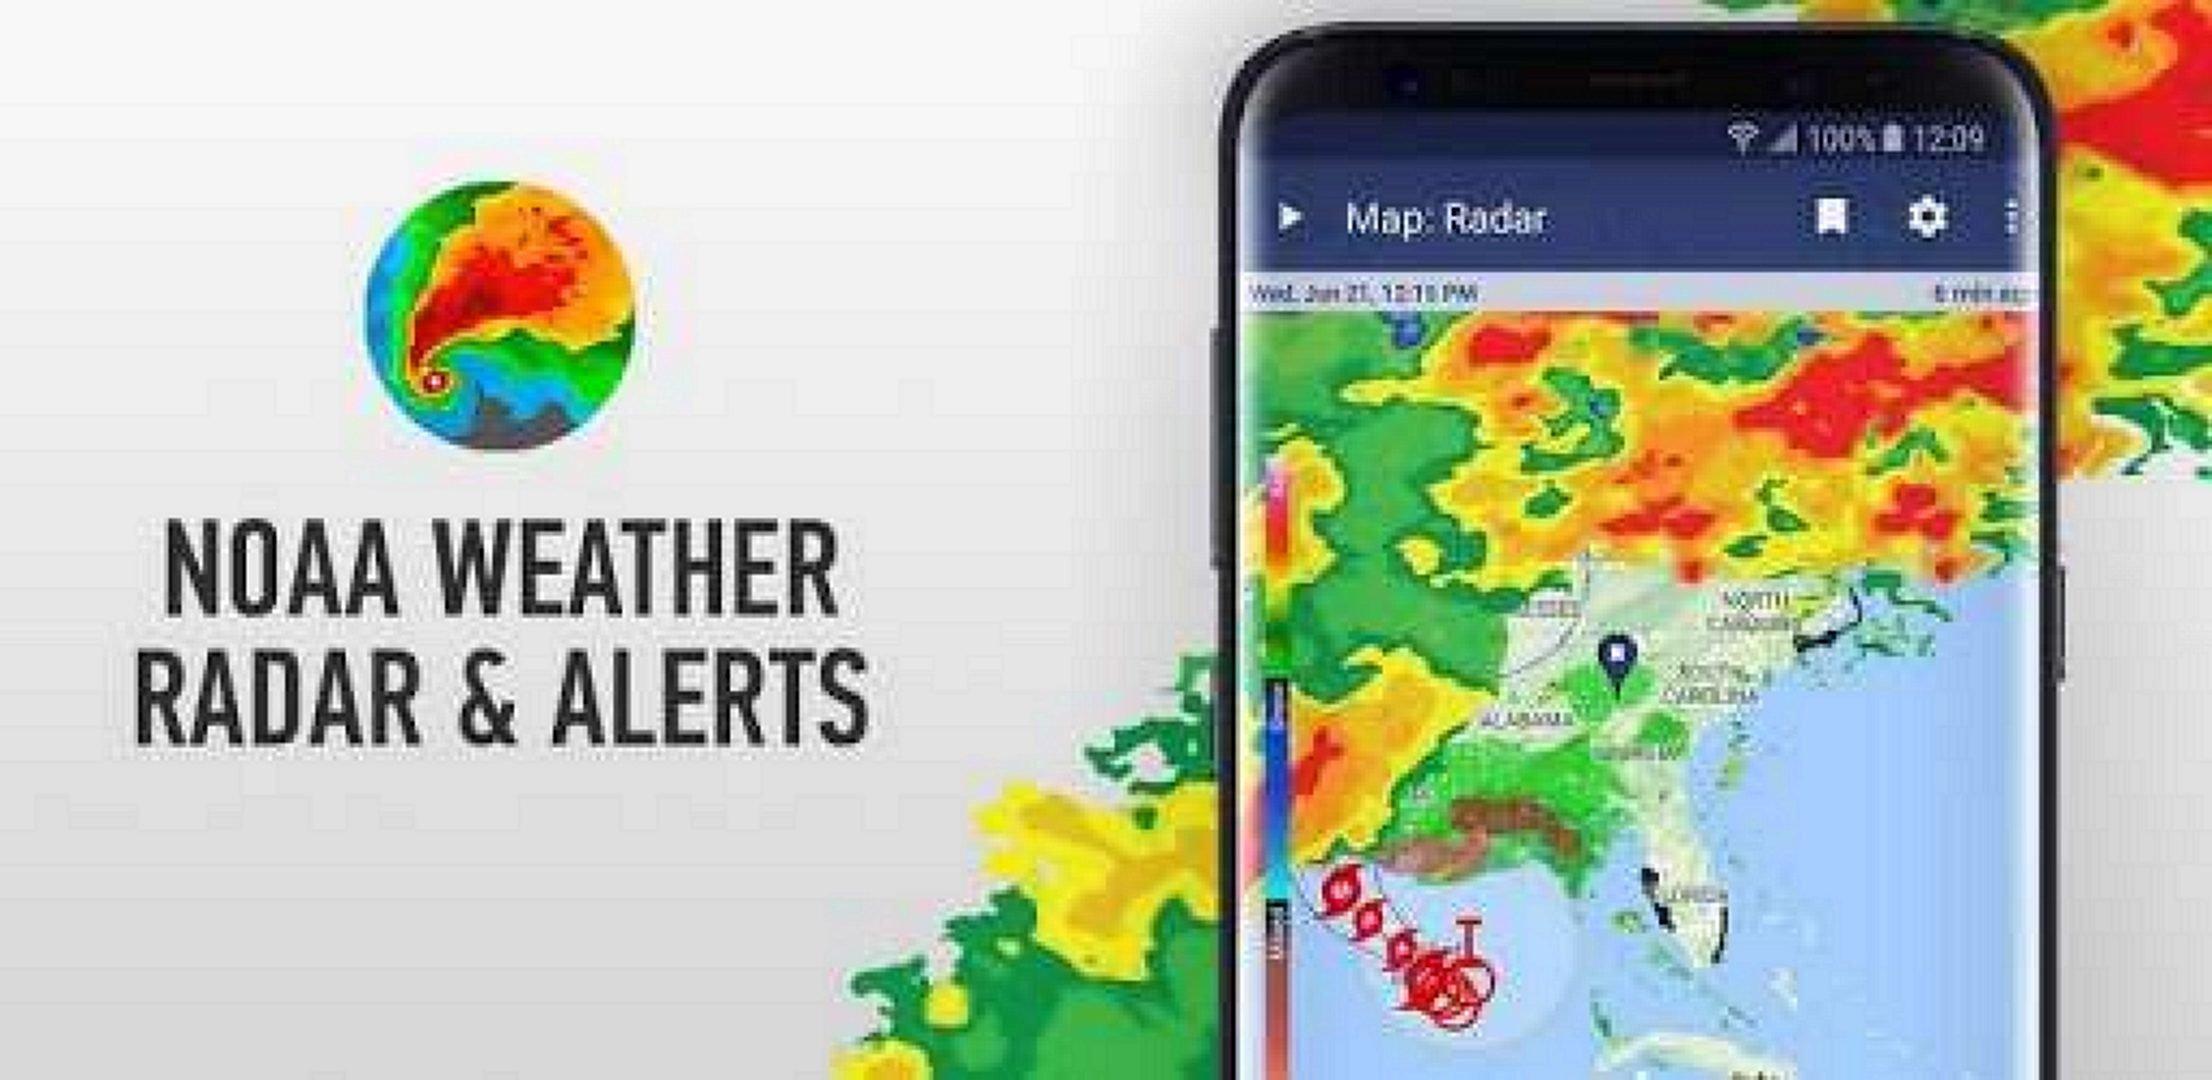 NOAA Weather&Radar Alerts